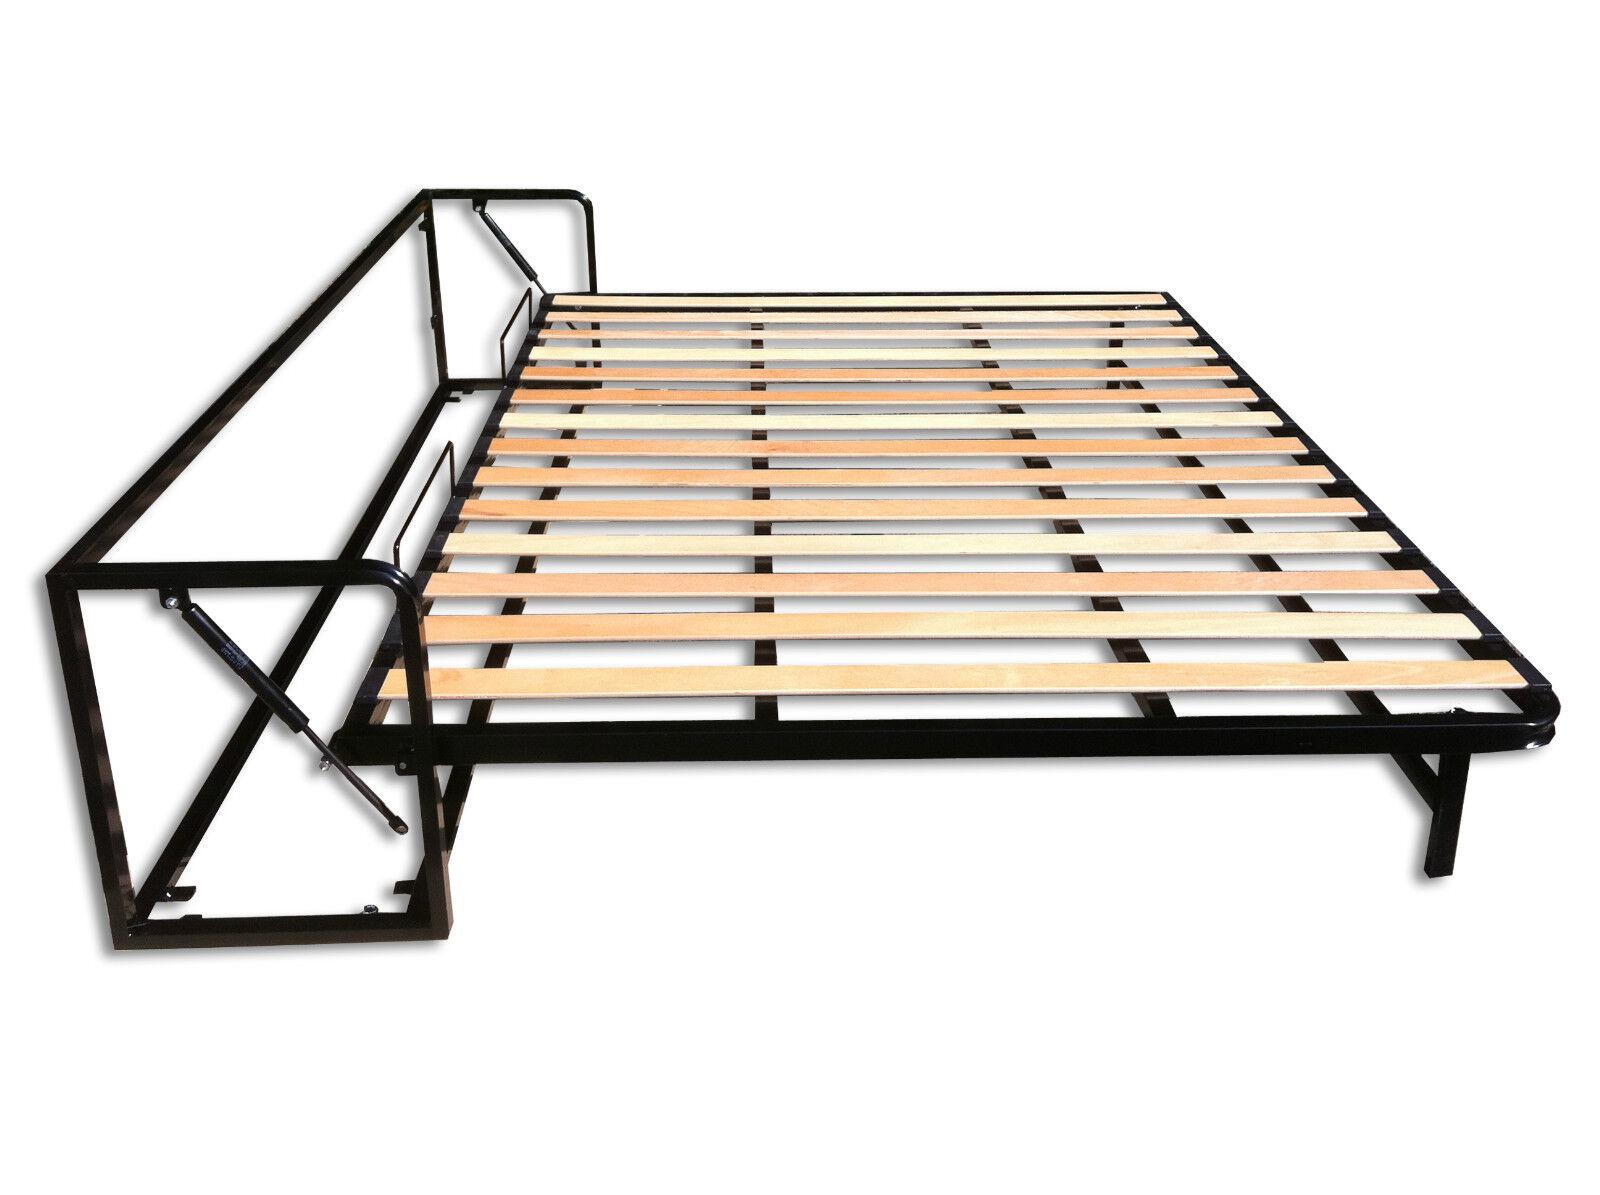 lit escamotable horizontal 90x200 140x190 140x200 160x200 eur 283 67 picclick fr. Black Bedroom Furniture Sets. Home Design Ideas